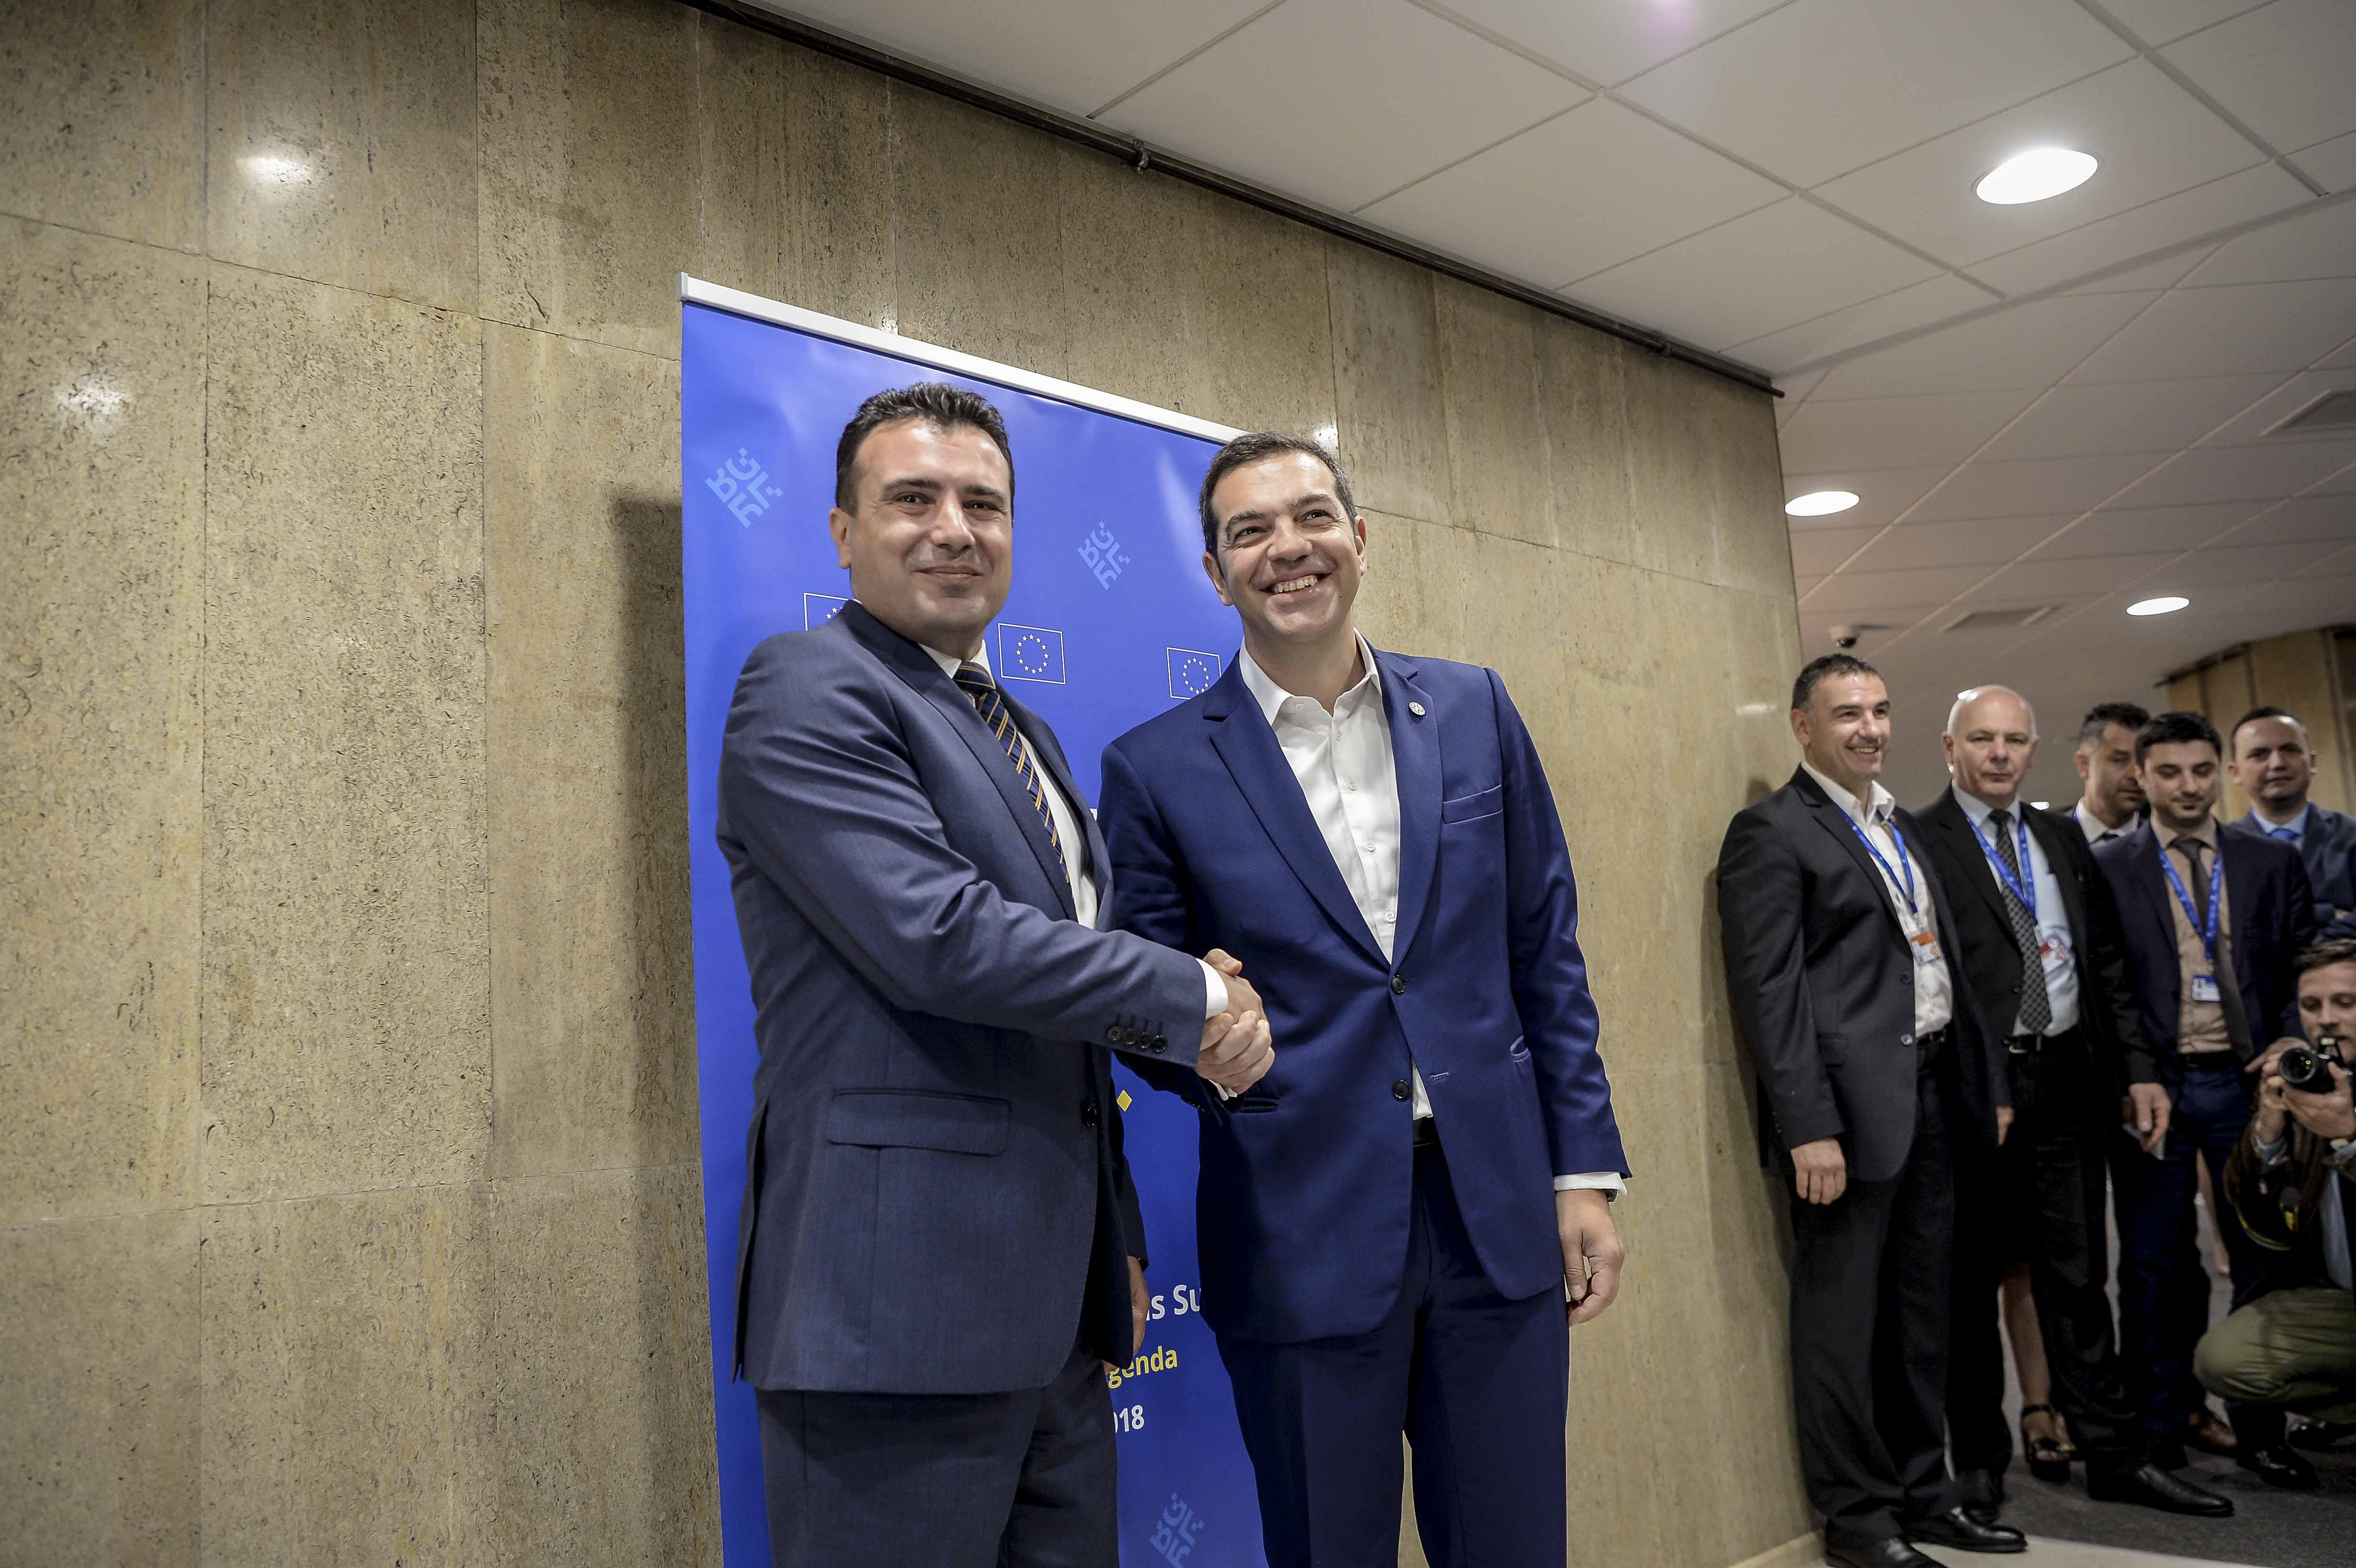 Zaev: Προκρίθηκε μία πρόταση για το ονοματολογικό , γύρω από την οποία θα υπάρξουν διαβουλεύσεις σε Αθήνα και Σκόπια